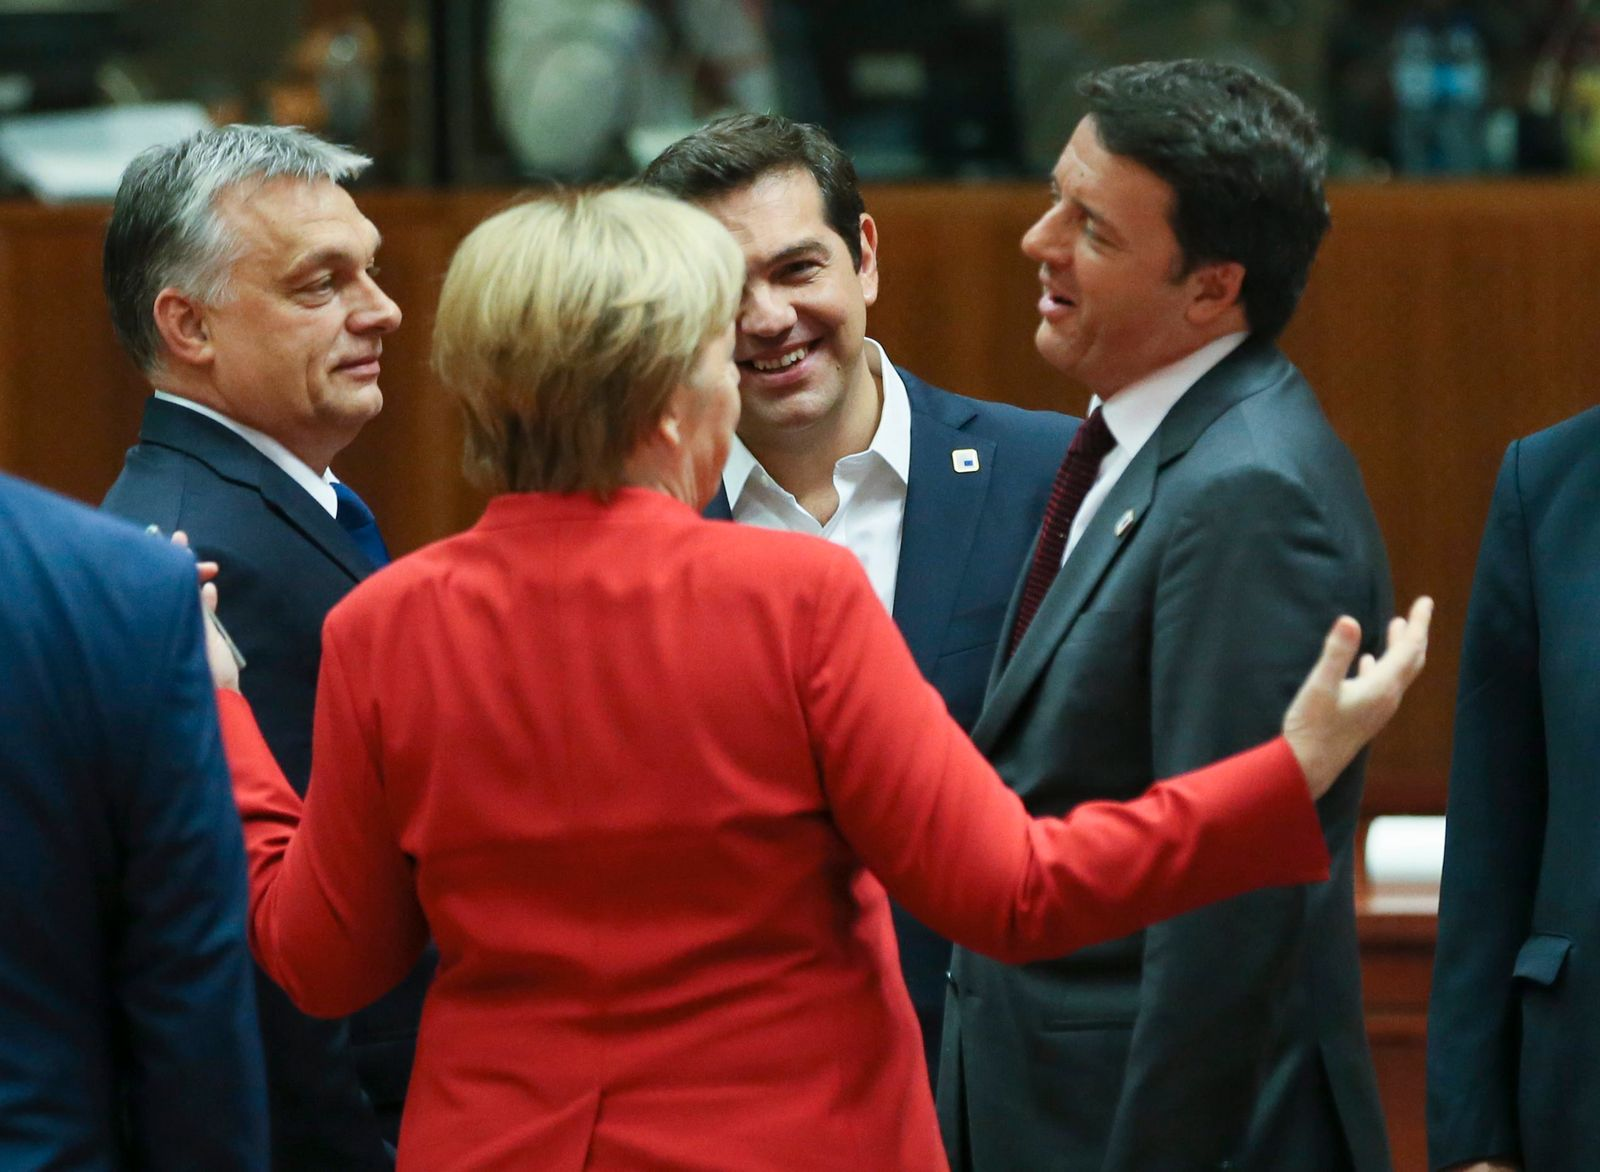 EU Summit / Merkel / Tsipras